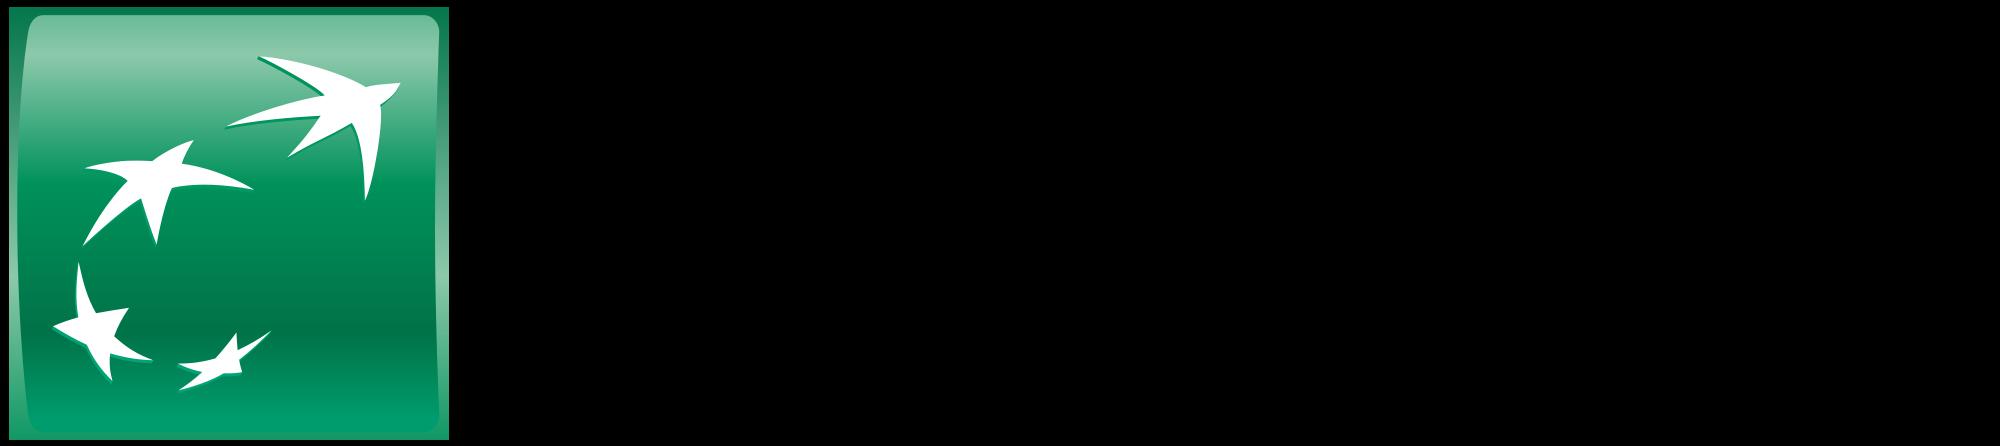 61,1 logo BNP